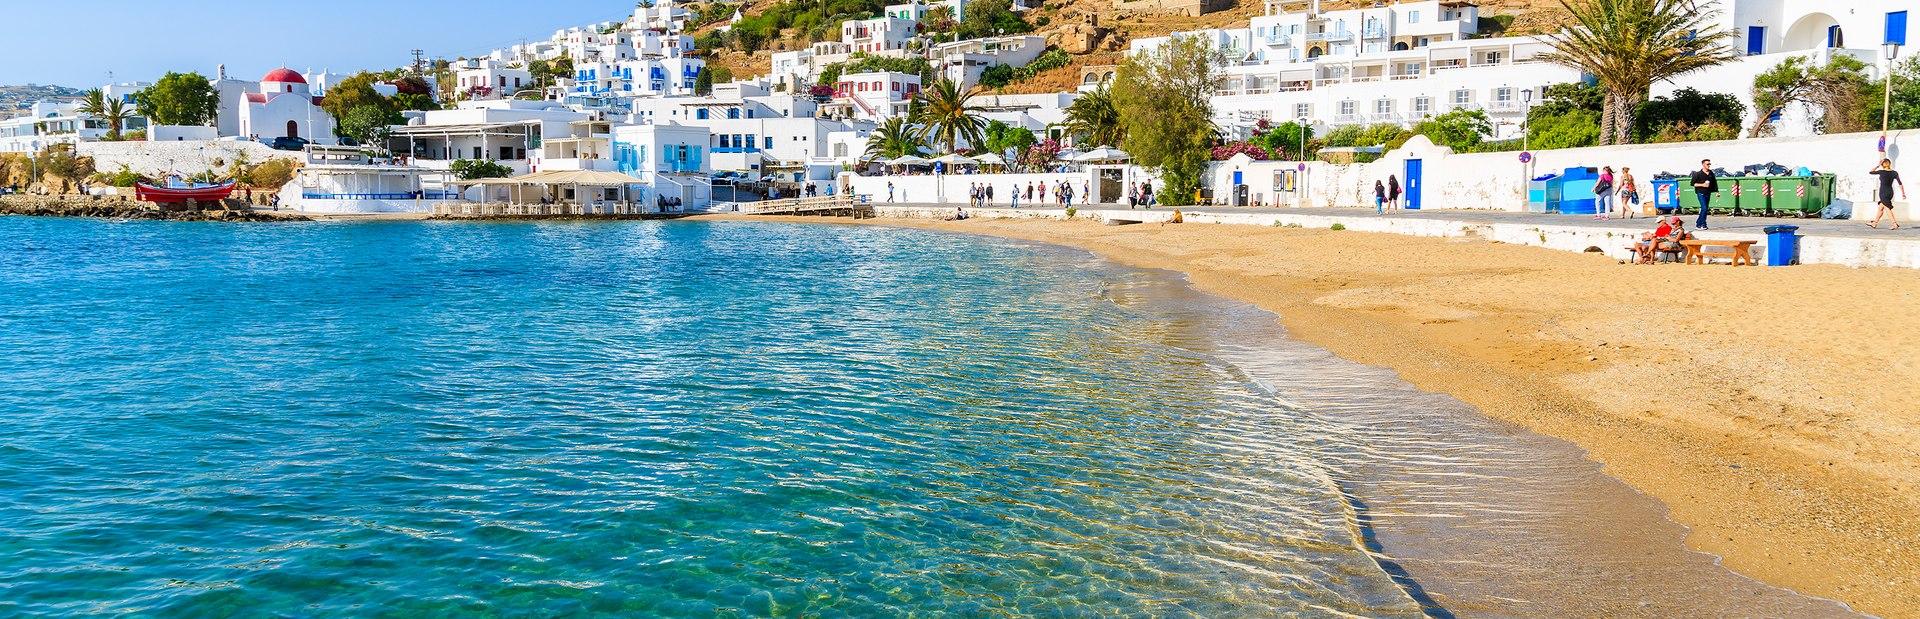 Mykonos charter itineraries